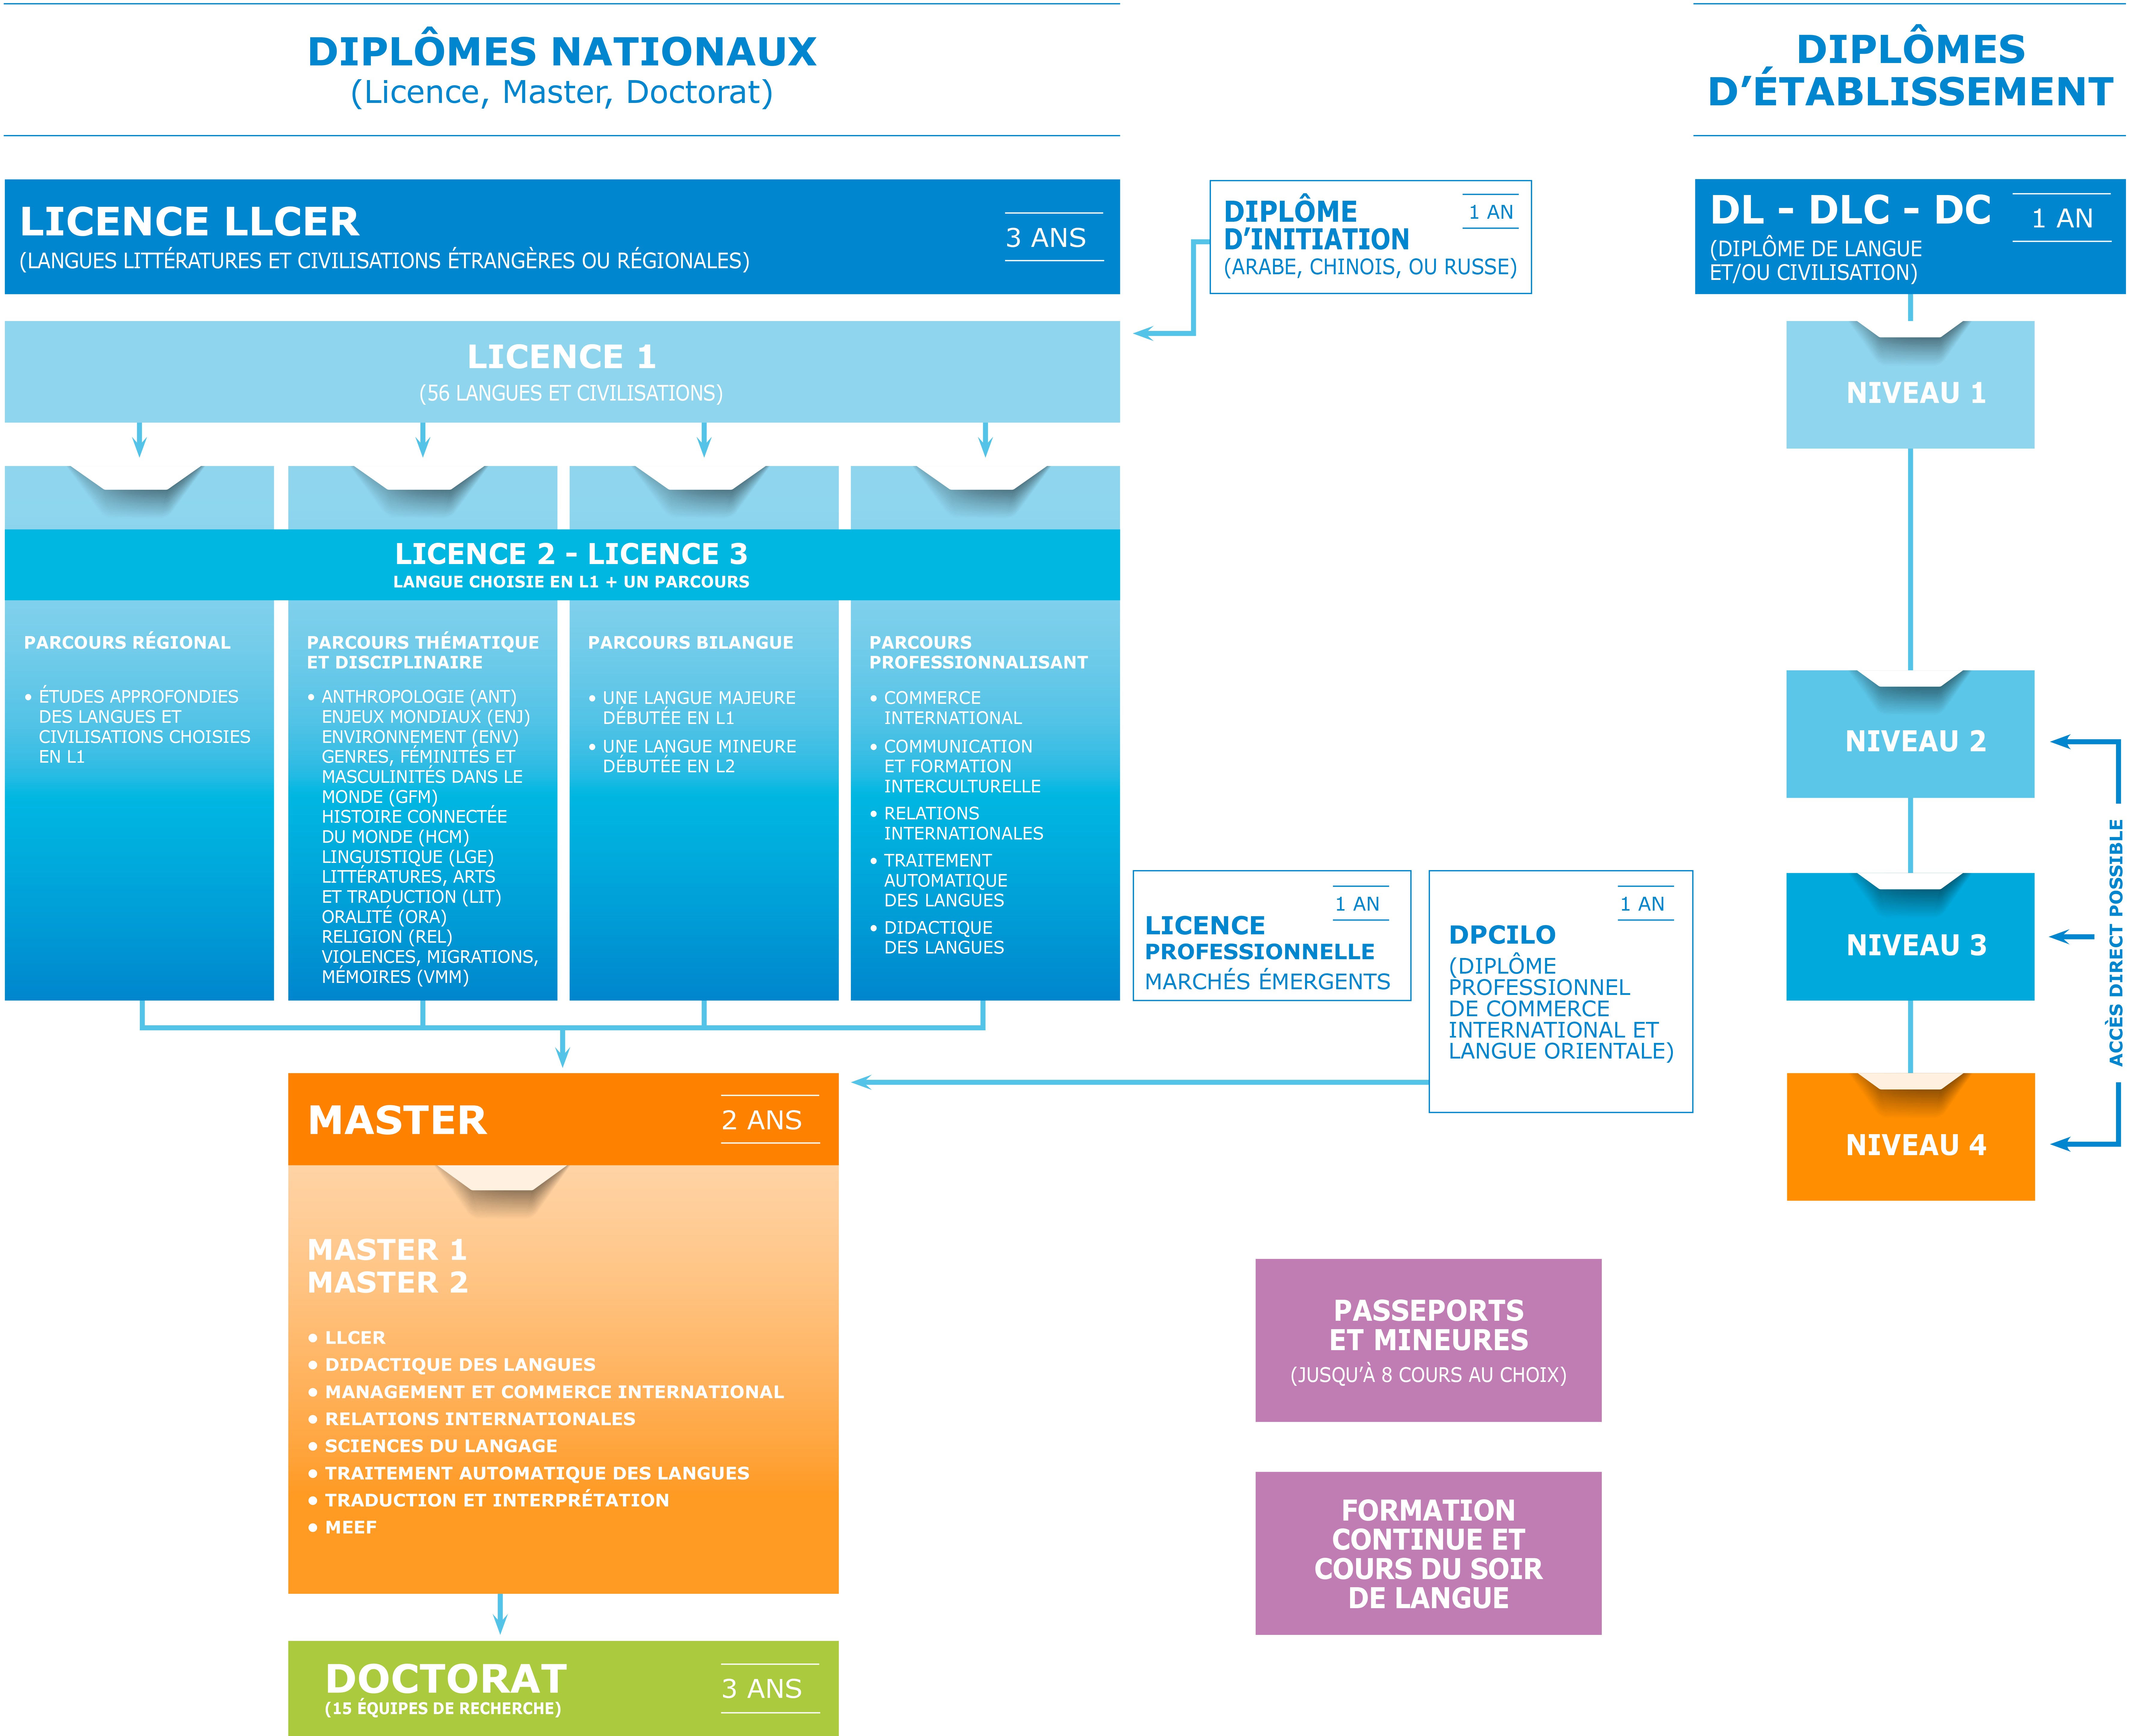 Schéma des formations 2019 de l'Inalco